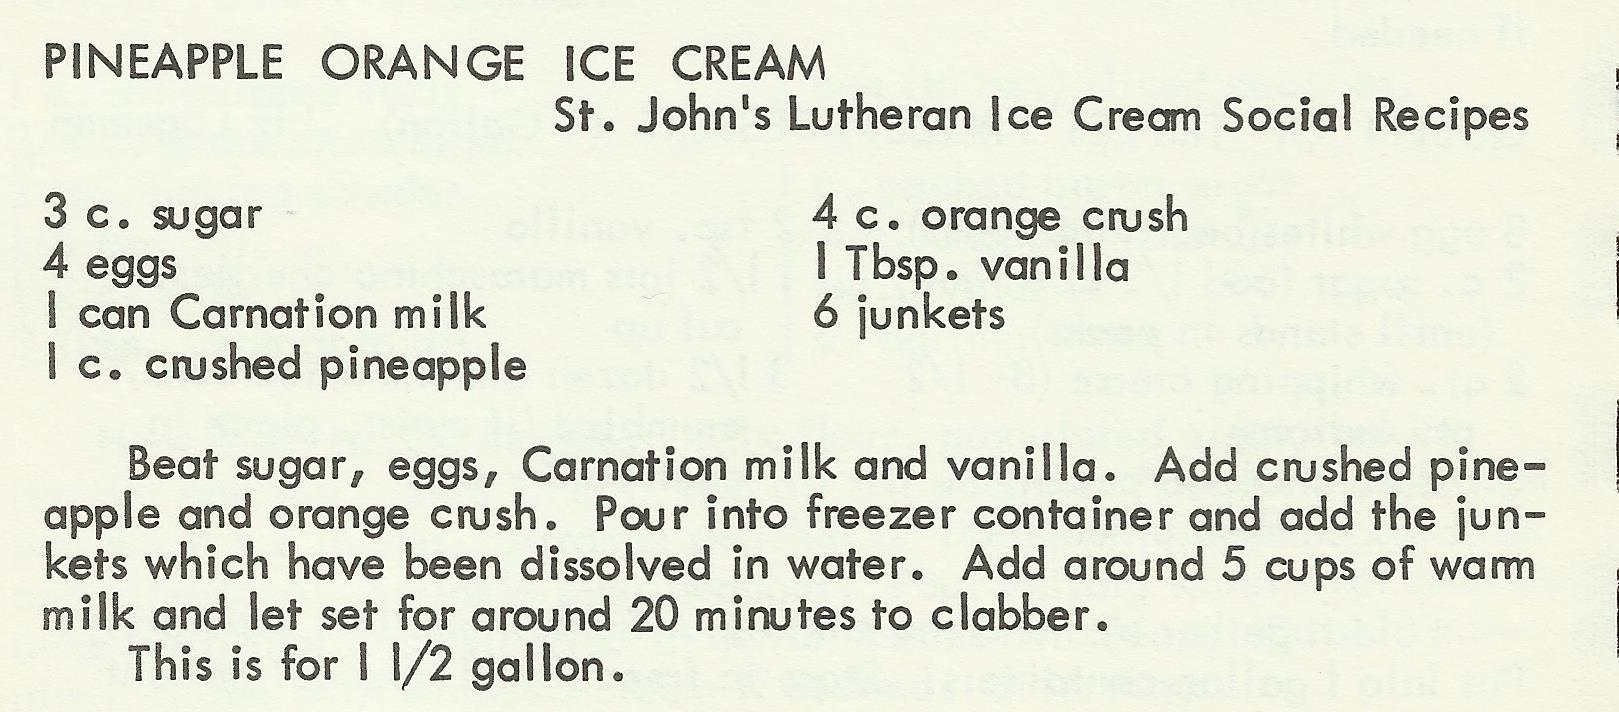 Pineapple Orange Ice Cream